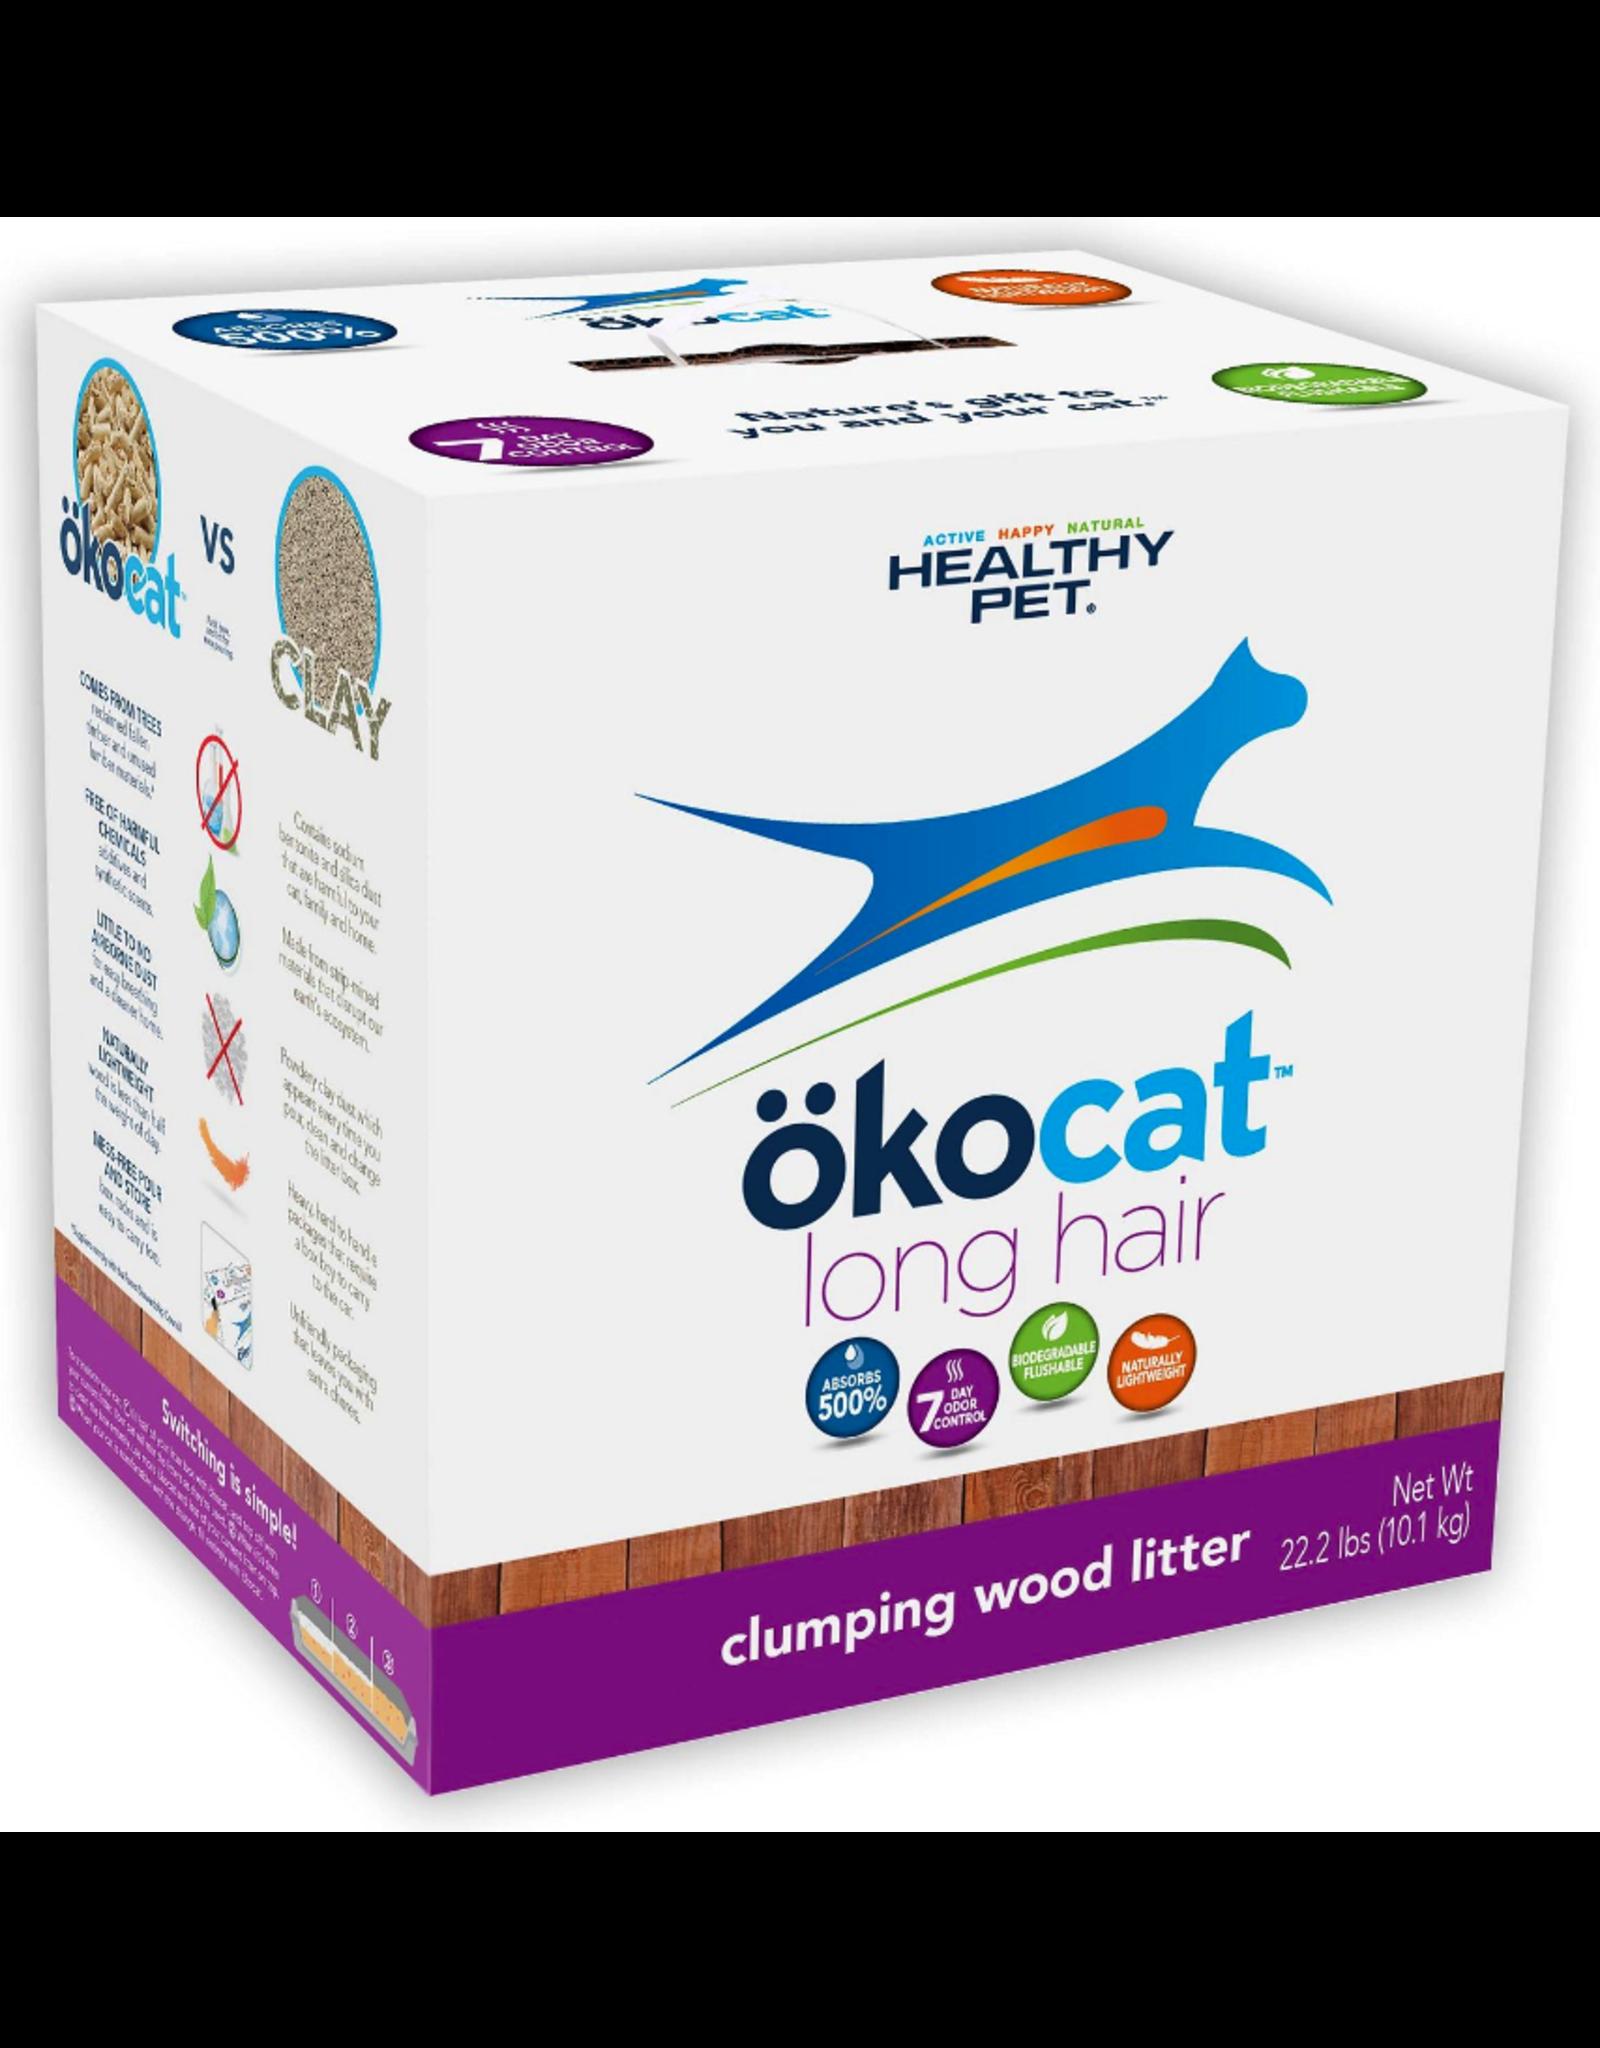 Healthy Pet Healthy Pet okocat Long Hair Clumping Wood Litter